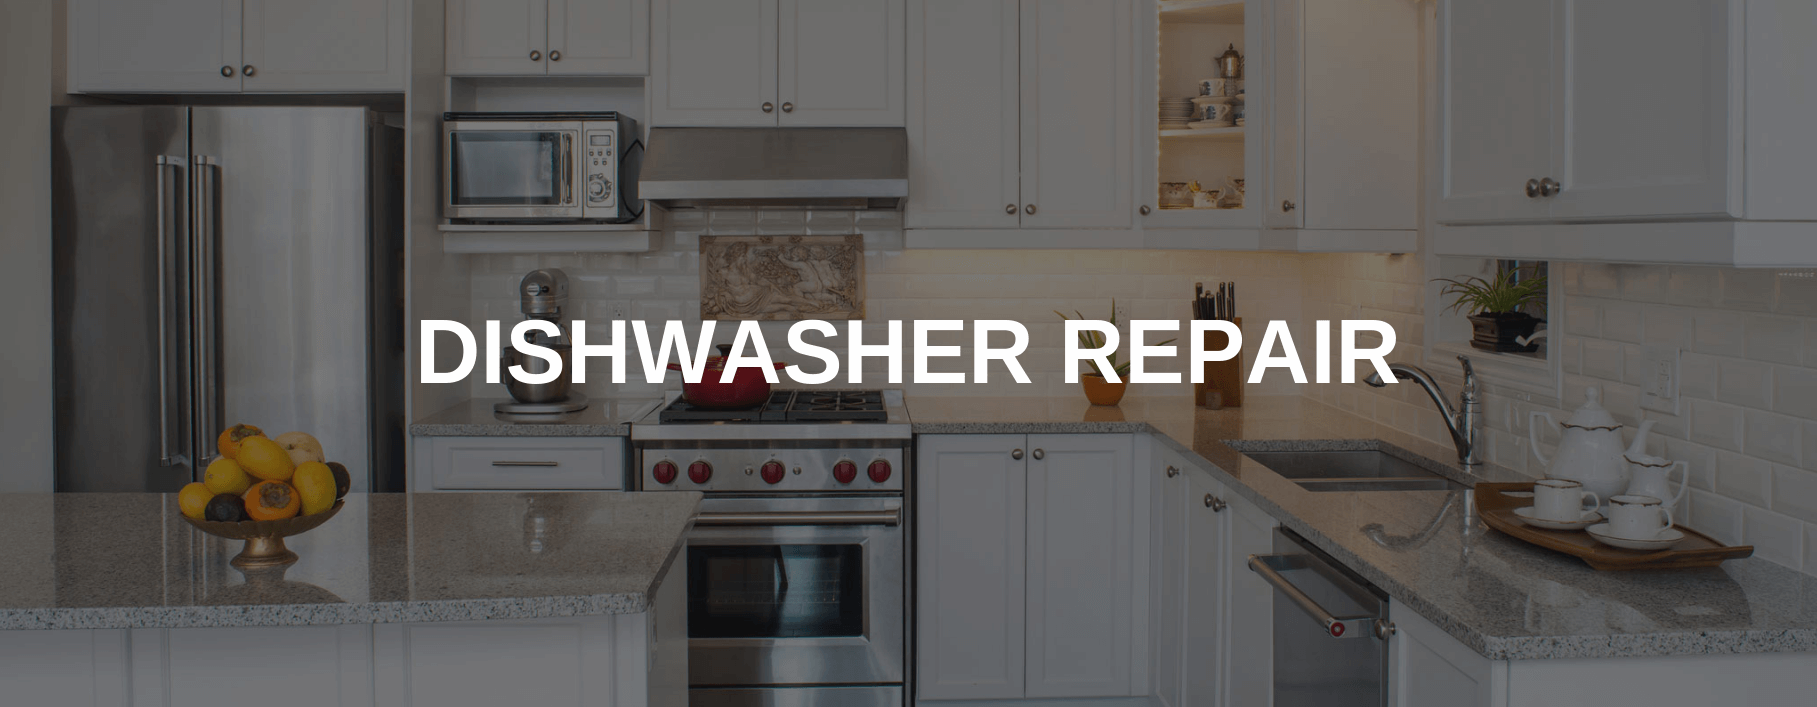 dishwasher repair newington